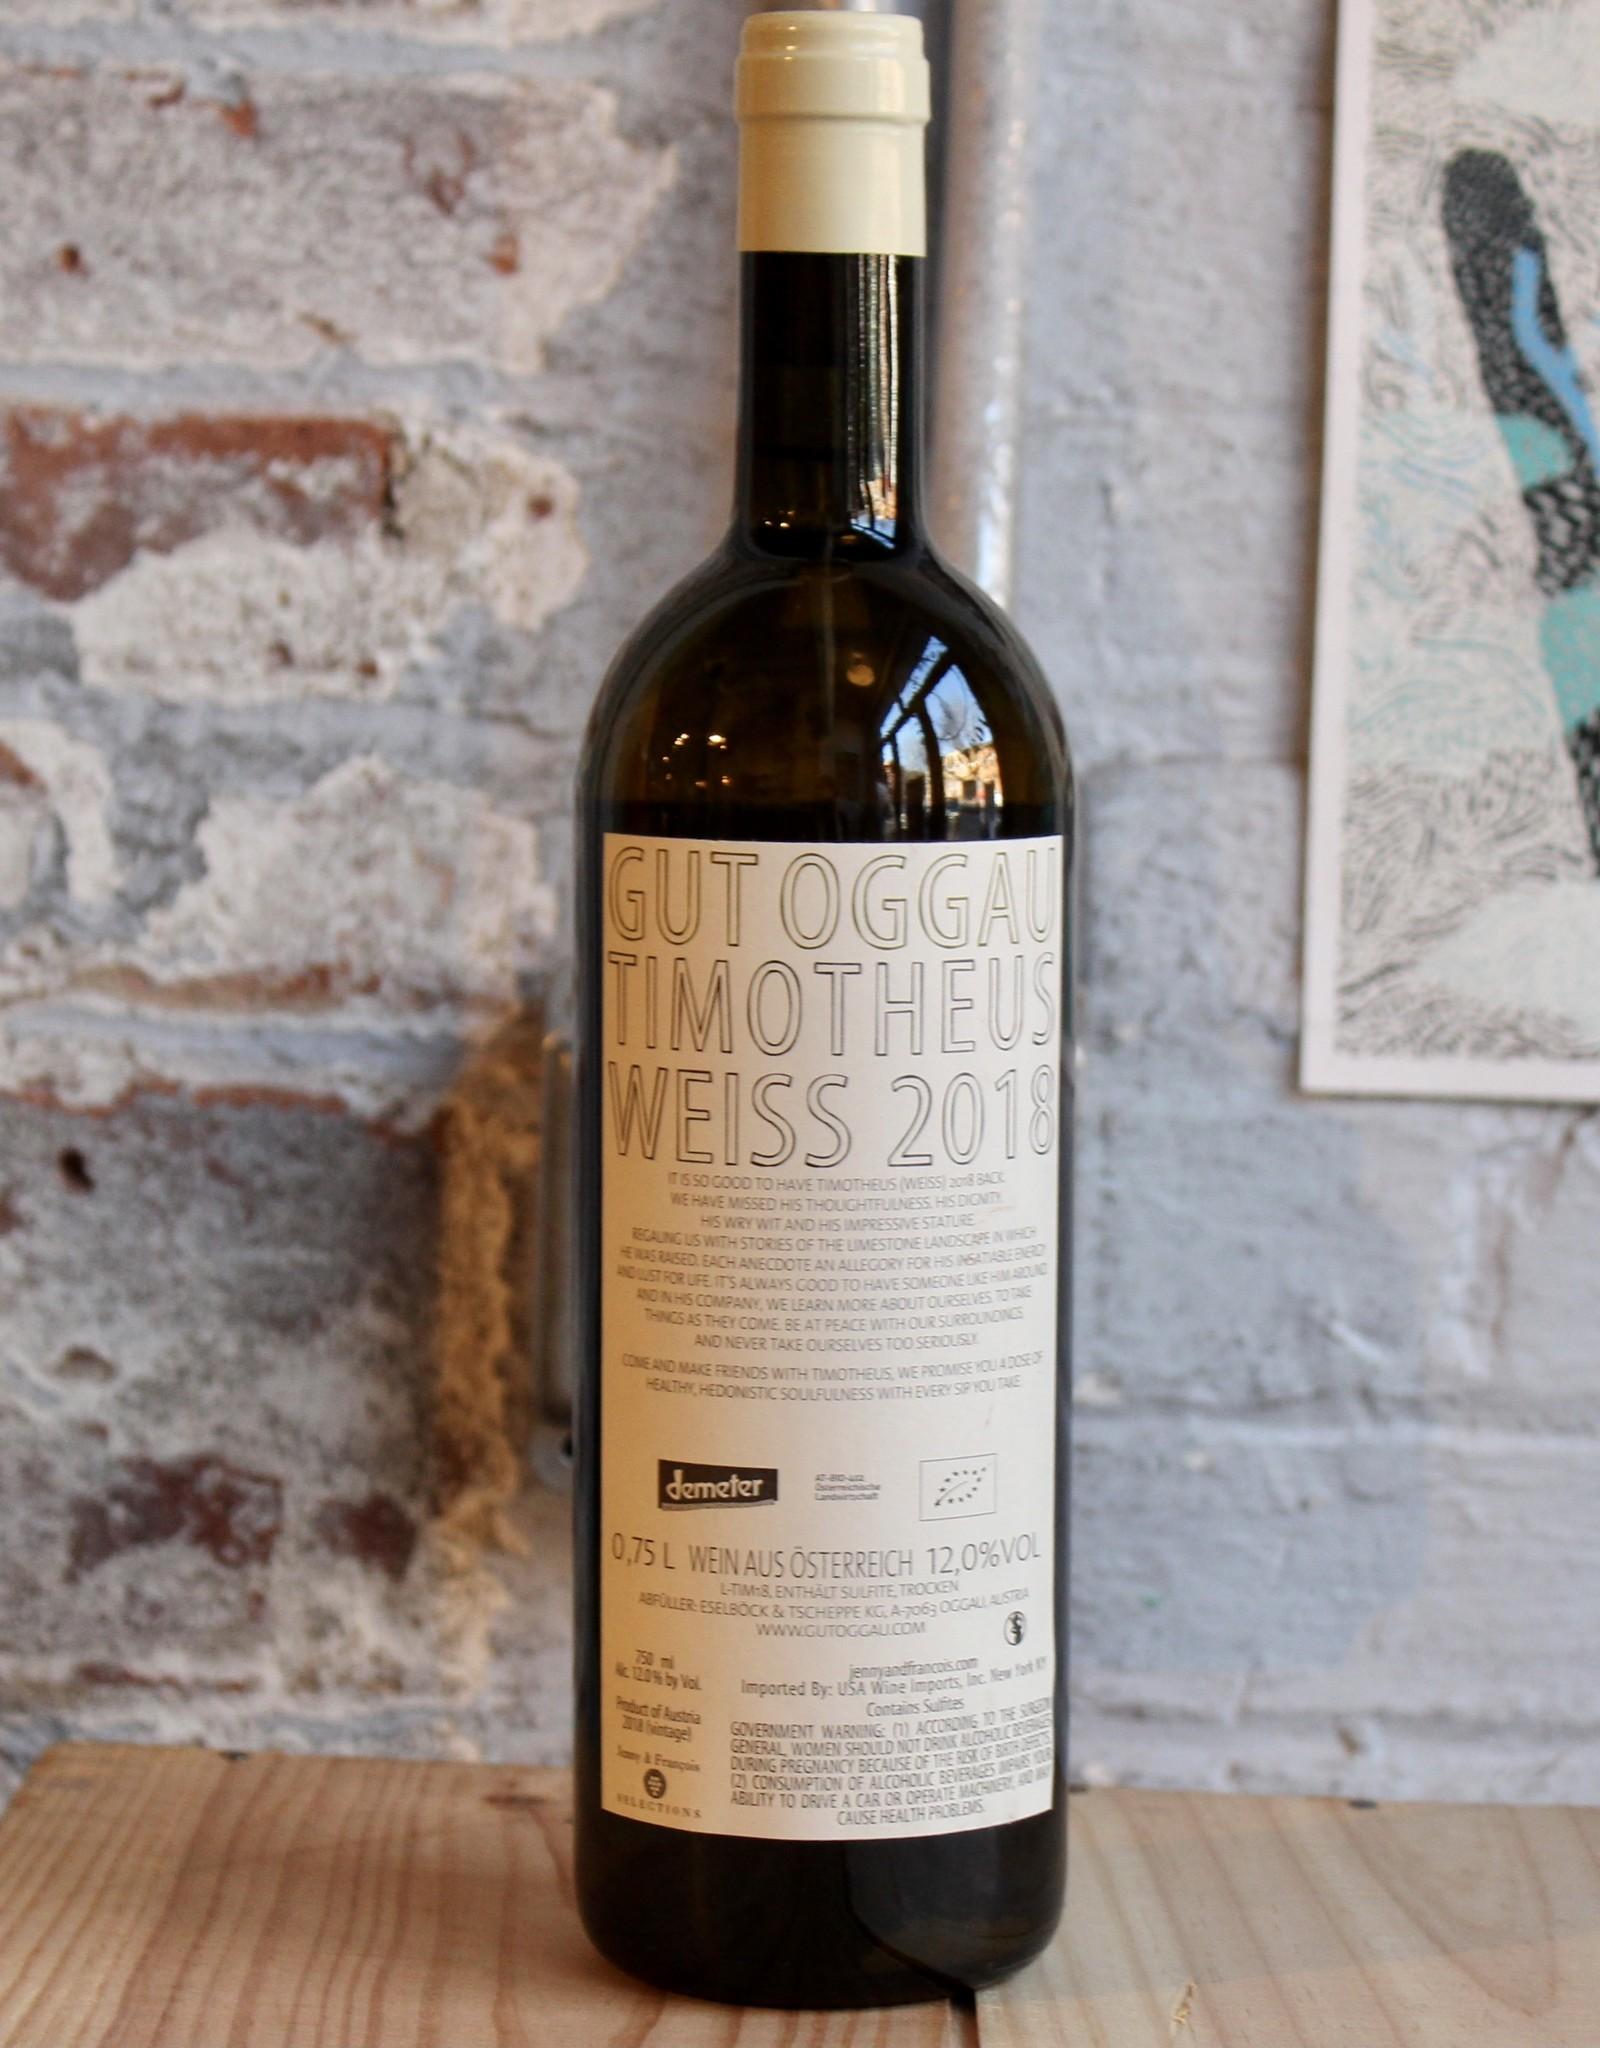 Wine 2018 Gut Oggau Timotheus - Burgenland, Austria (750ml)